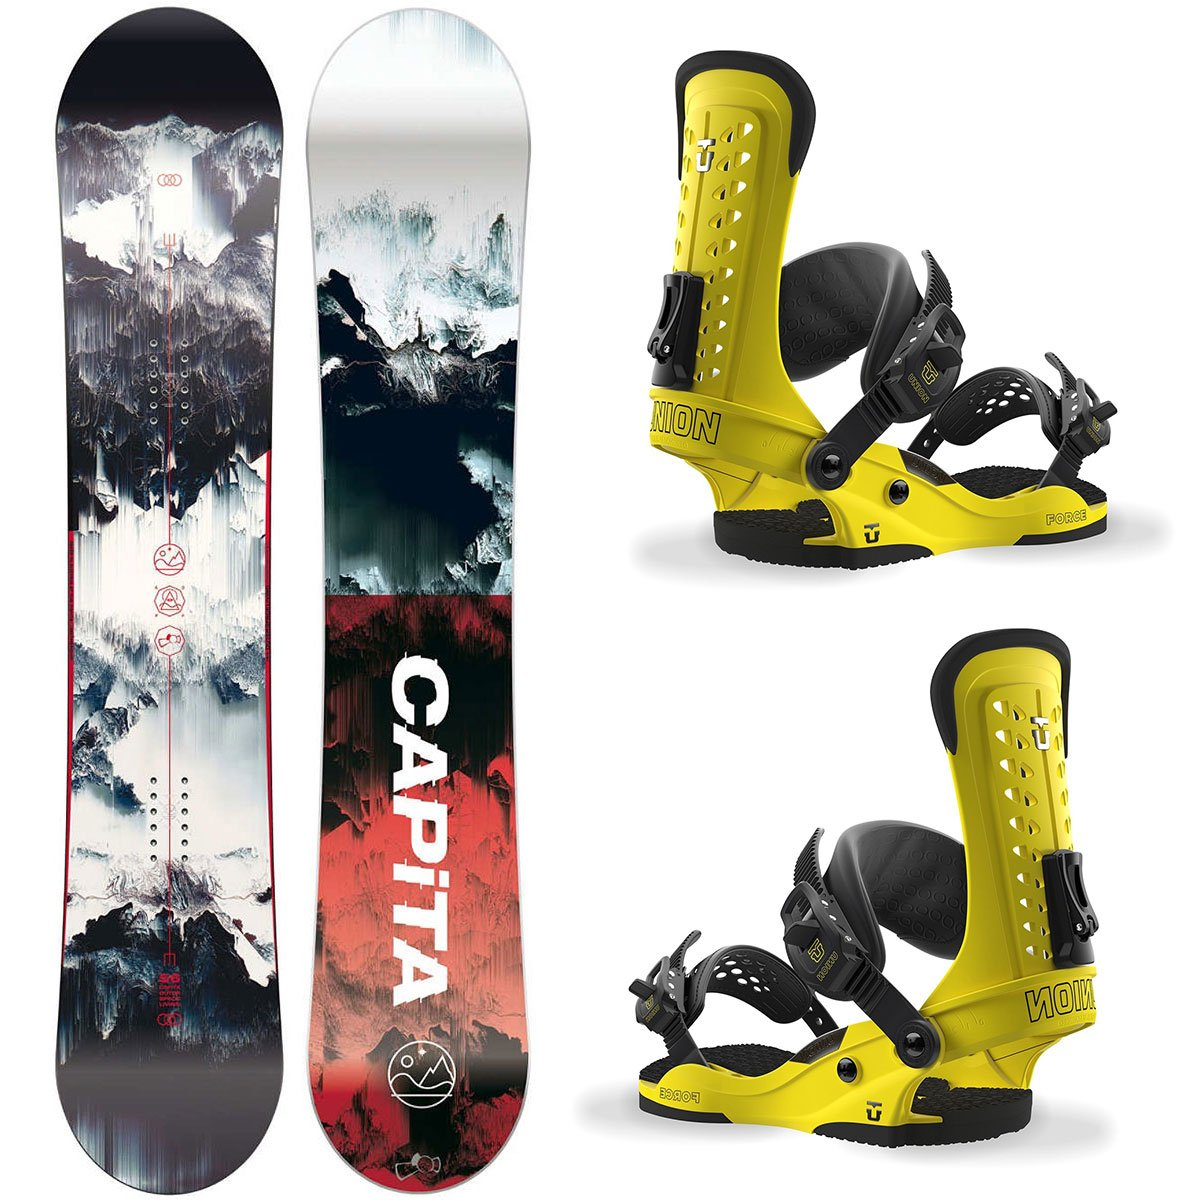 Snowboard Set: CAPITA Outerspace Living 156cm + UNION